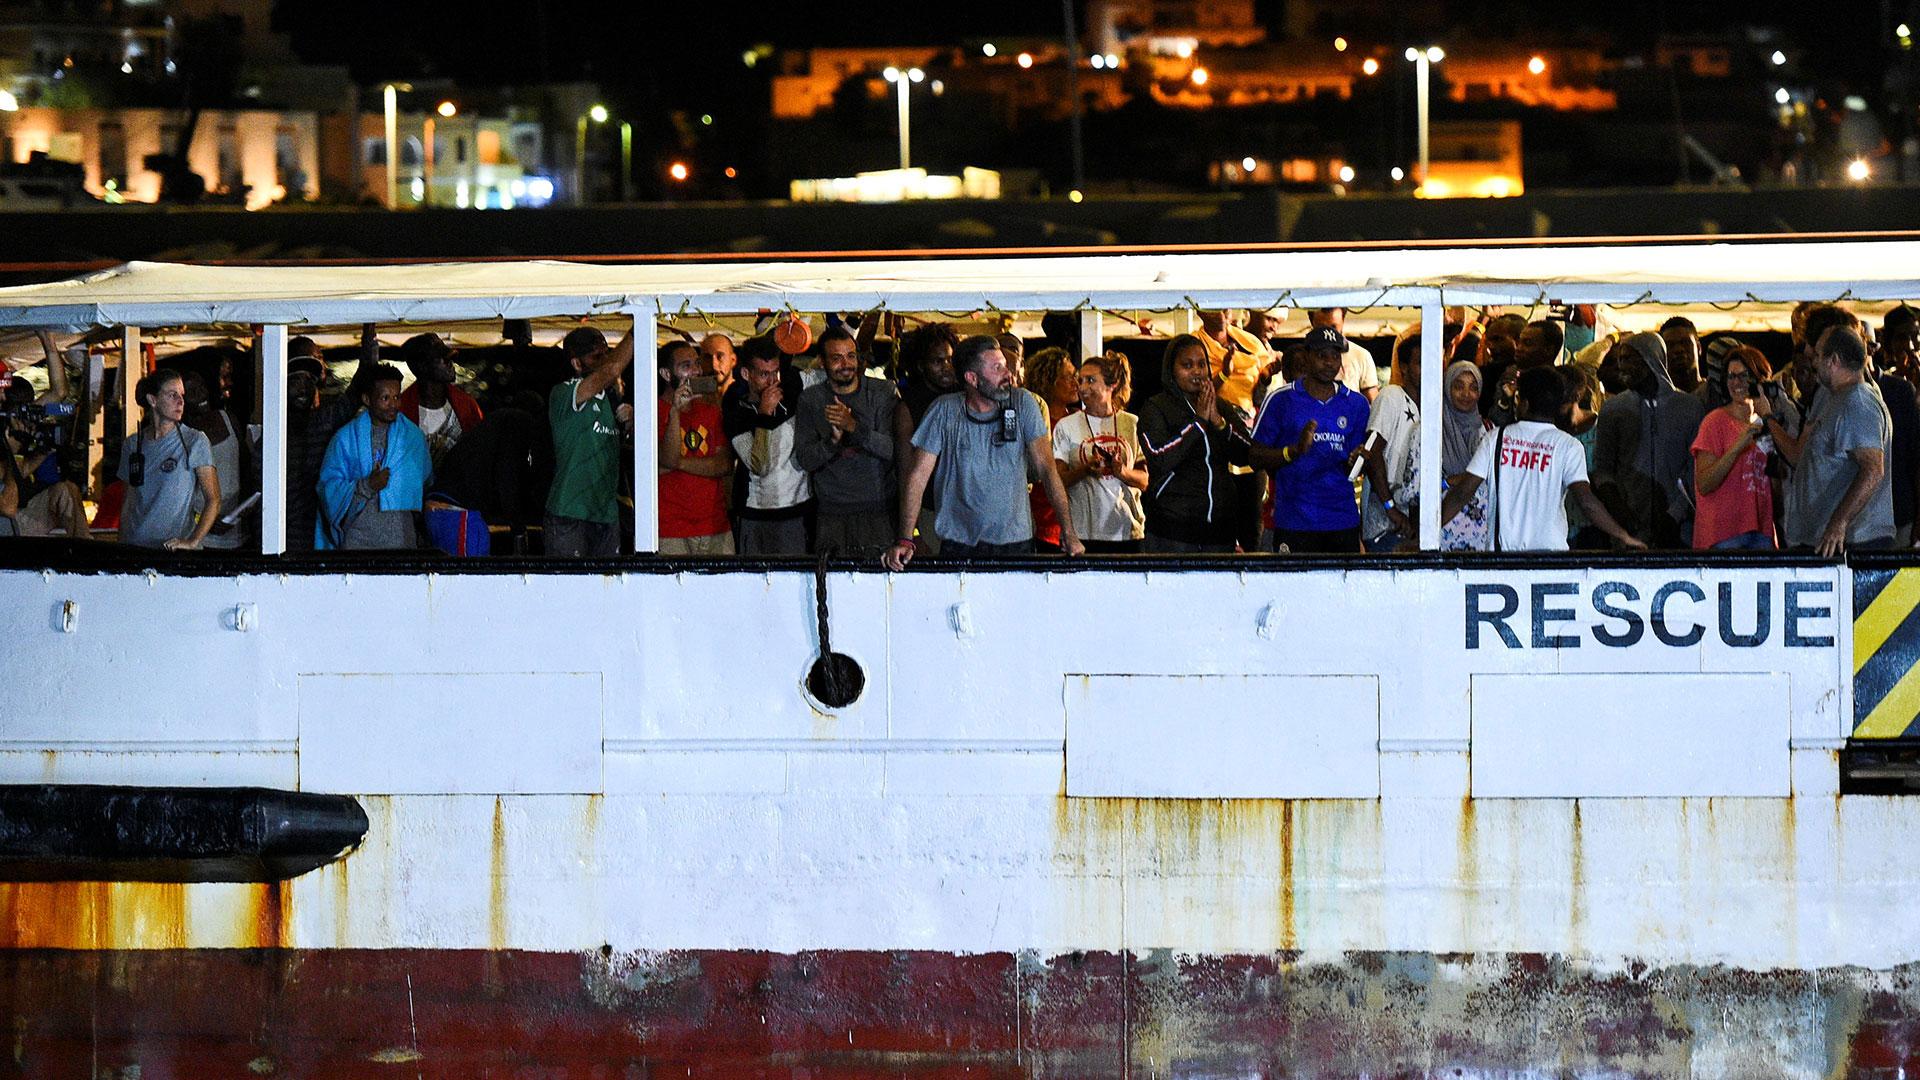 El barco de rescate español Open Arms con migrantes a bordo llega a Lampedusa, Italia, el 20 de agosto de 2019 a la noche (REUTERS/Guglielmo Mangiapane)